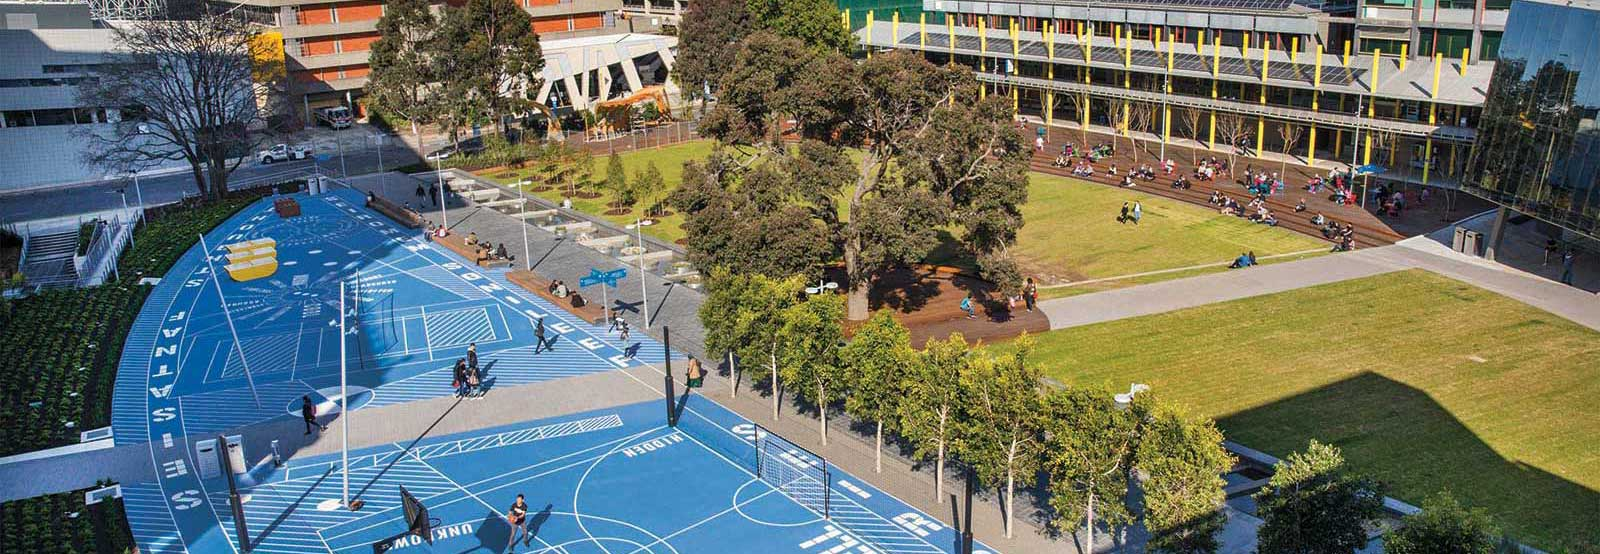 Caulfield Village – <span>Monash University</span>